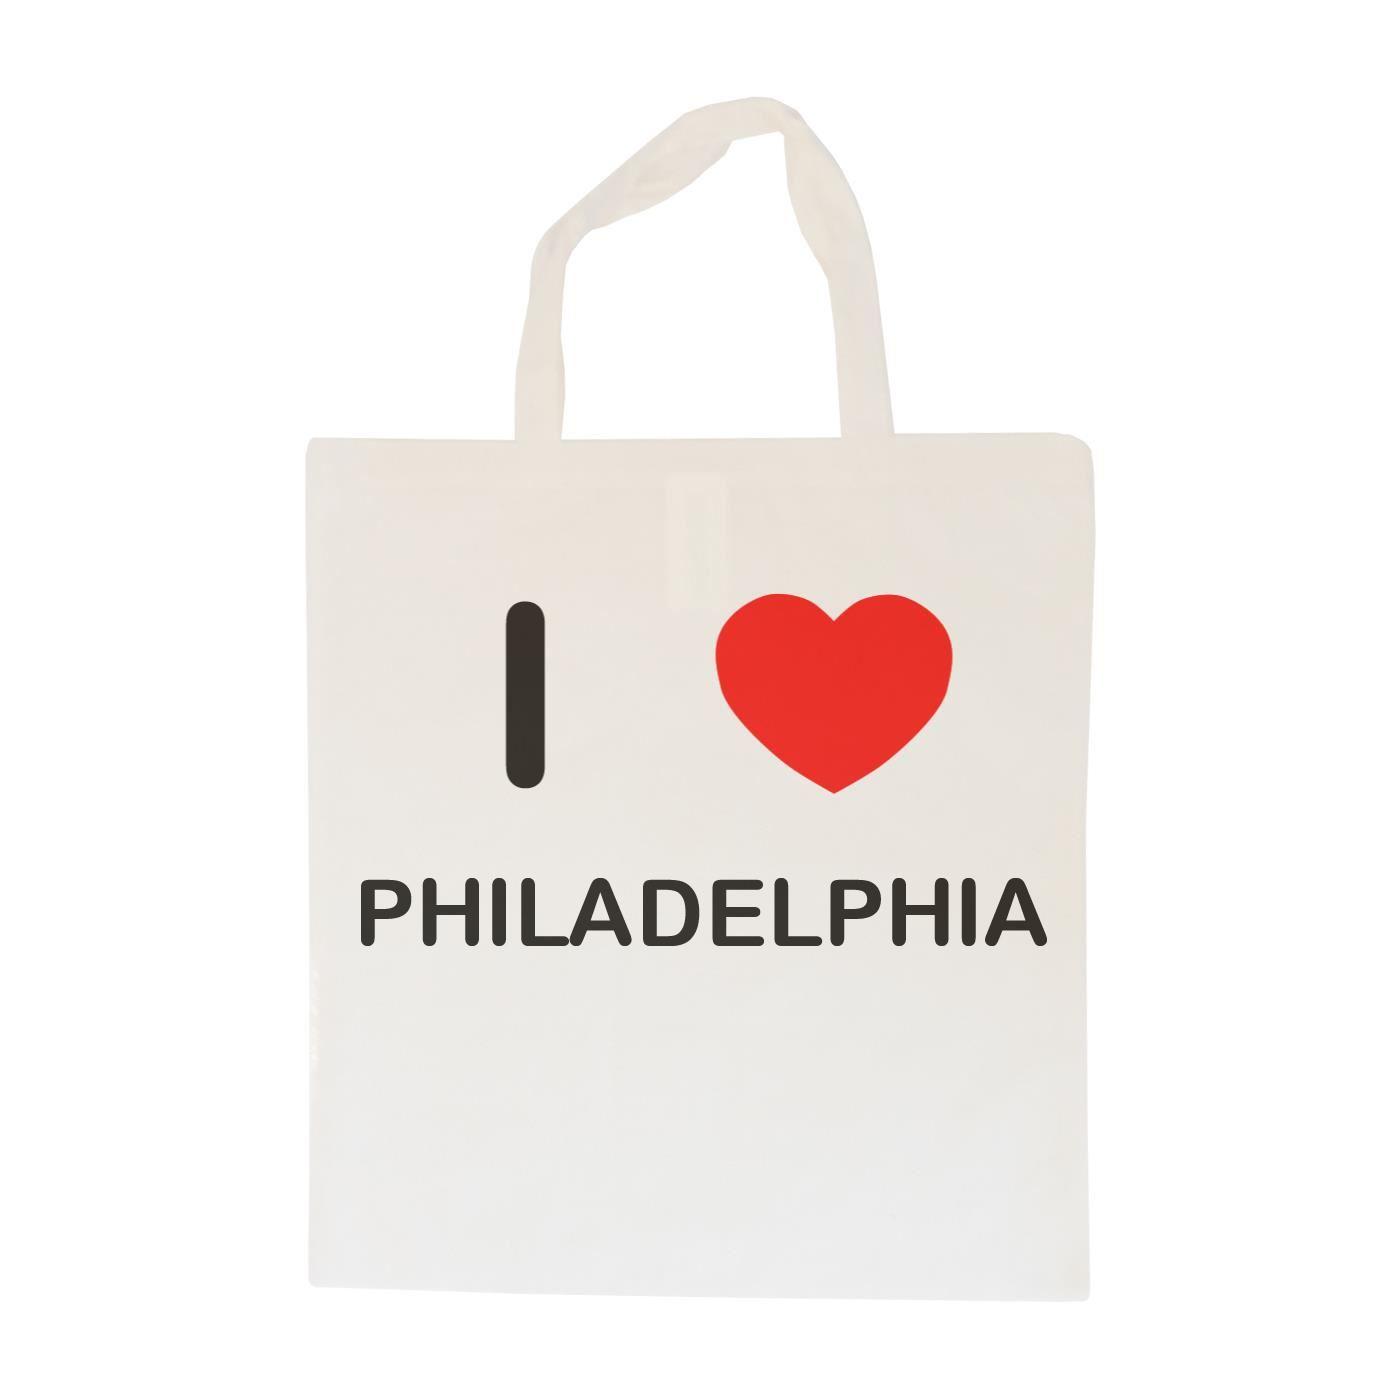 I Love Philadelphia - Cotton Bag | Size choice Tote, Shopper or Sling